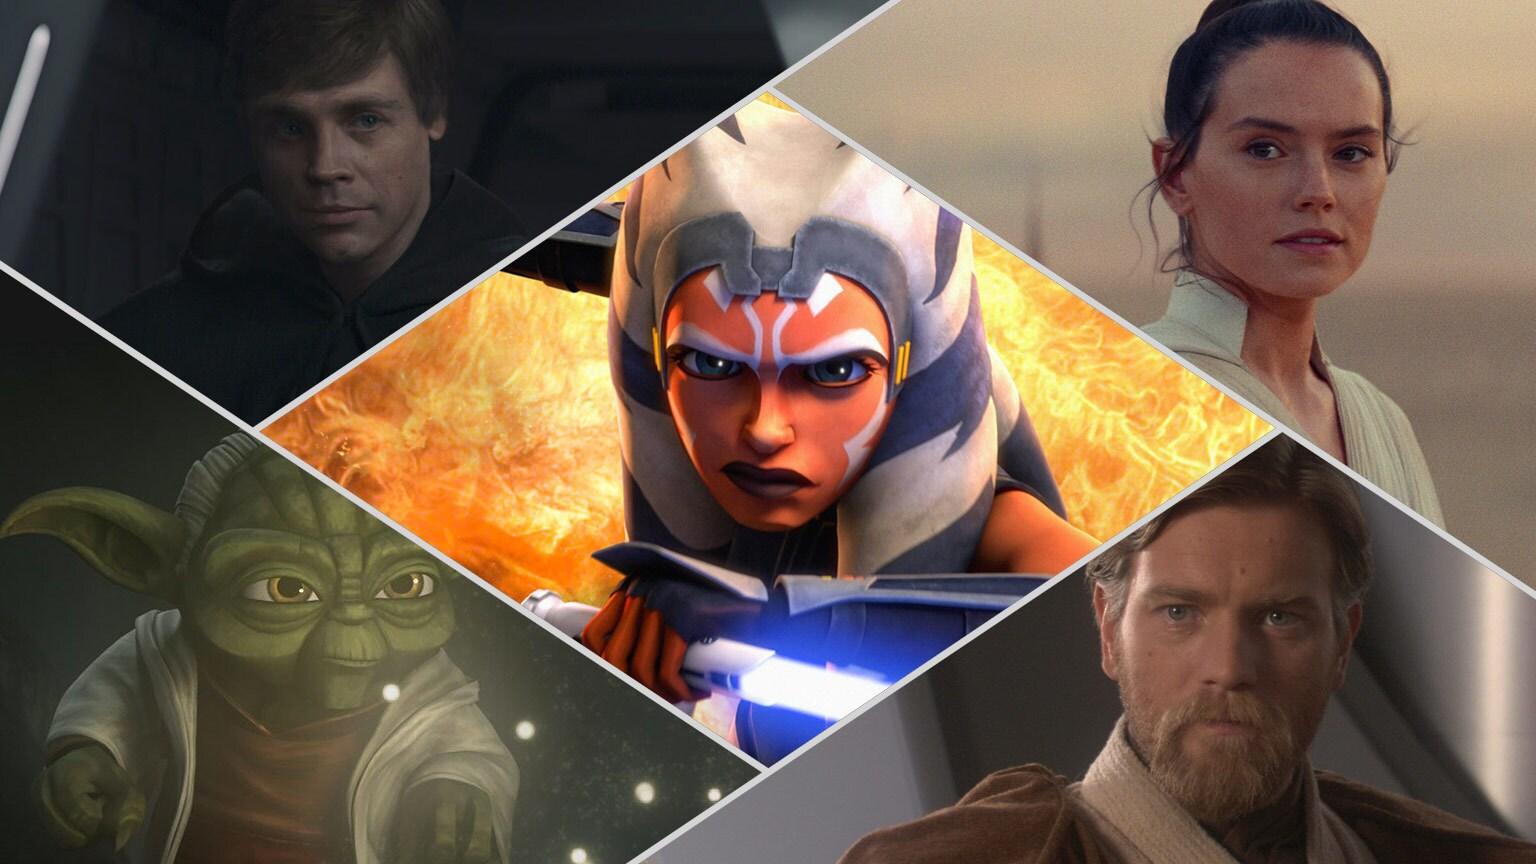 Quiz: Can You Unscramble These Jedi Names?